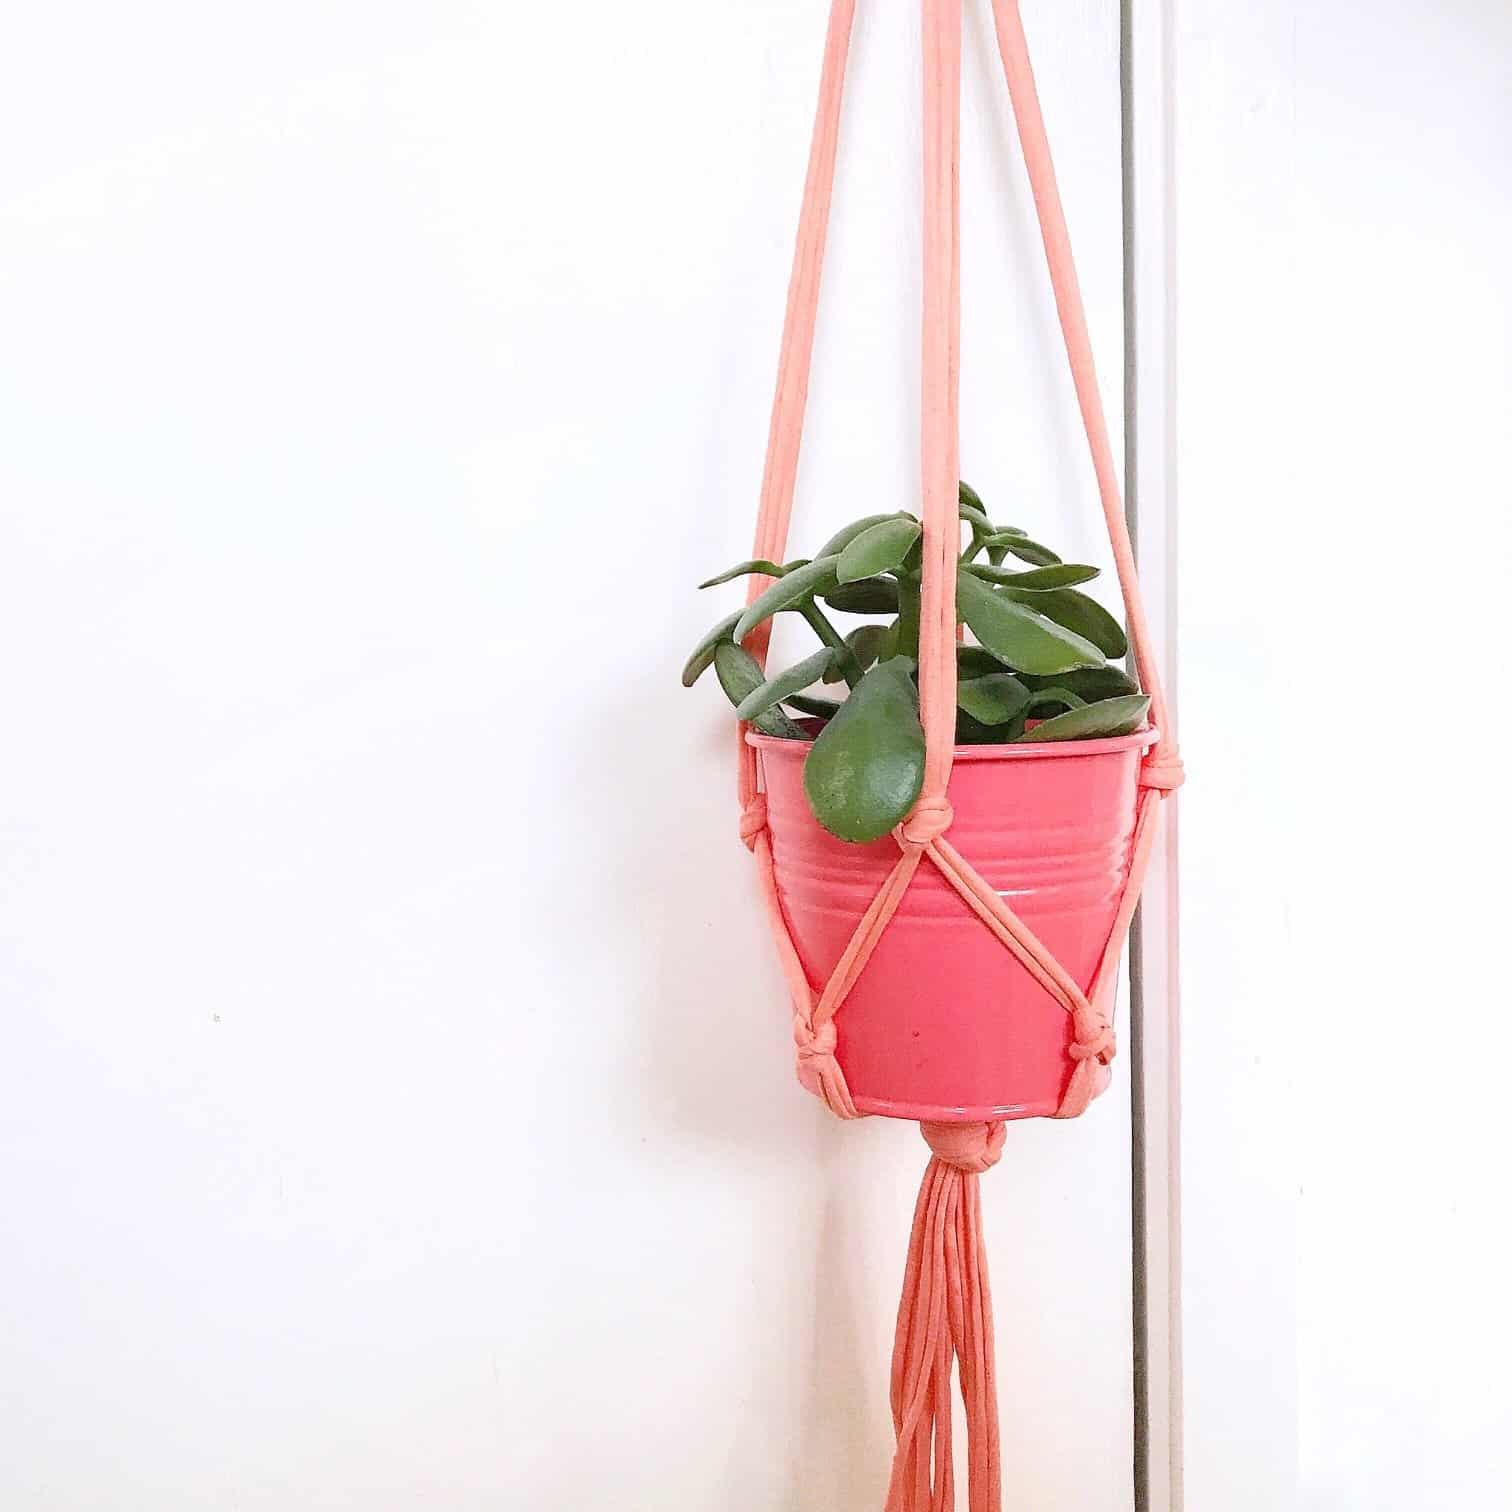 My Coral Pink Macrame Plant Hanger